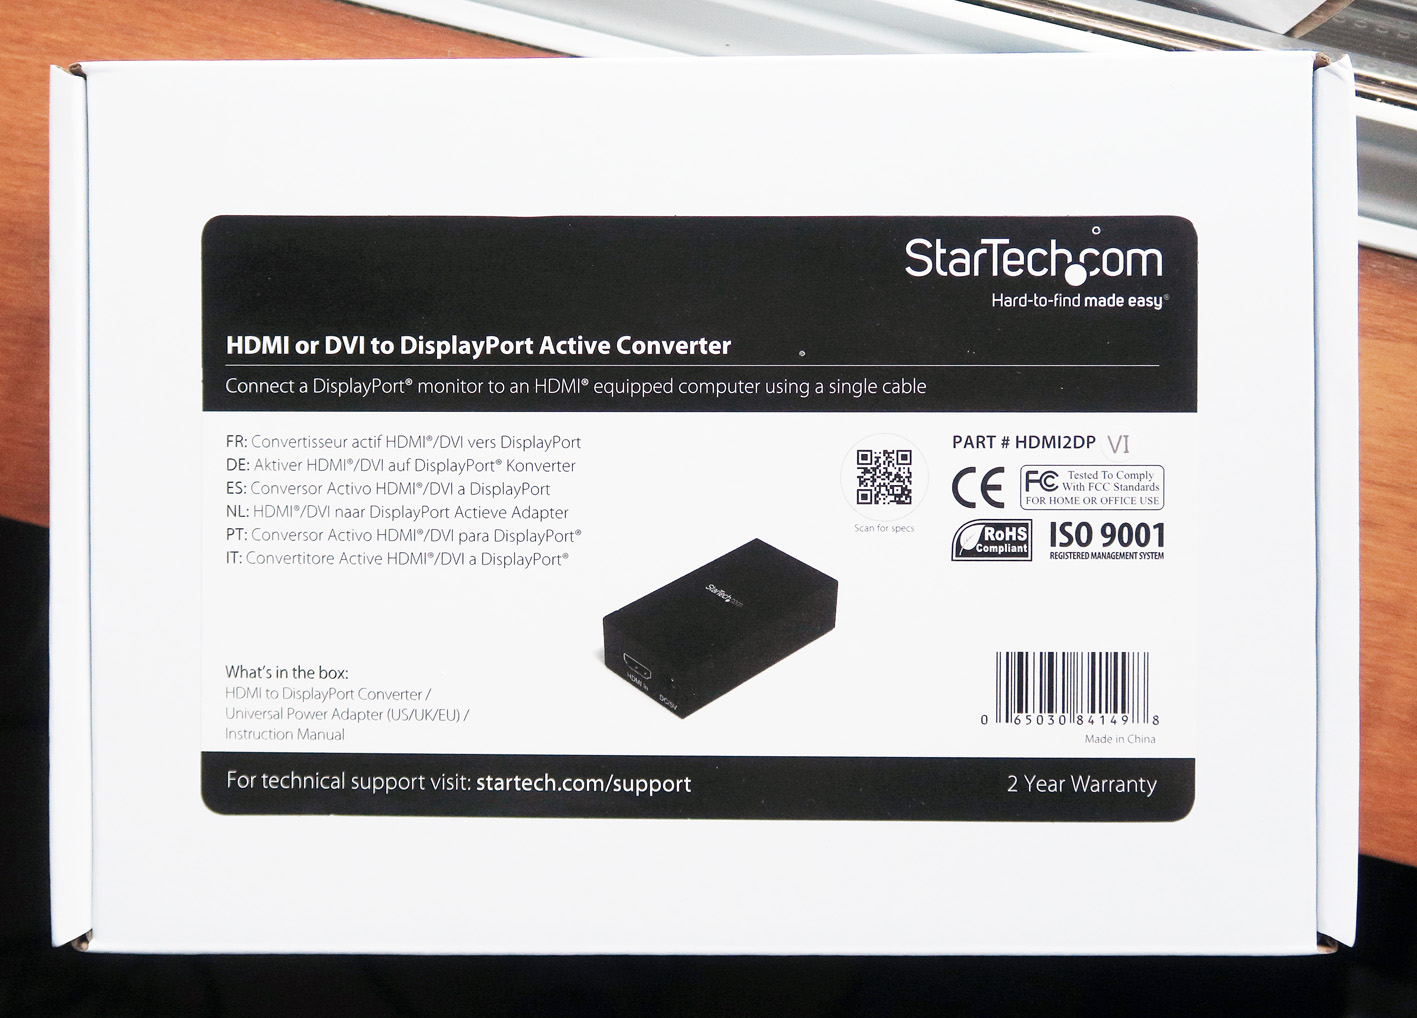 1 STARTECH HDMI to DISPLAYPORT ACTIVE CONVERTER box copy.jpg